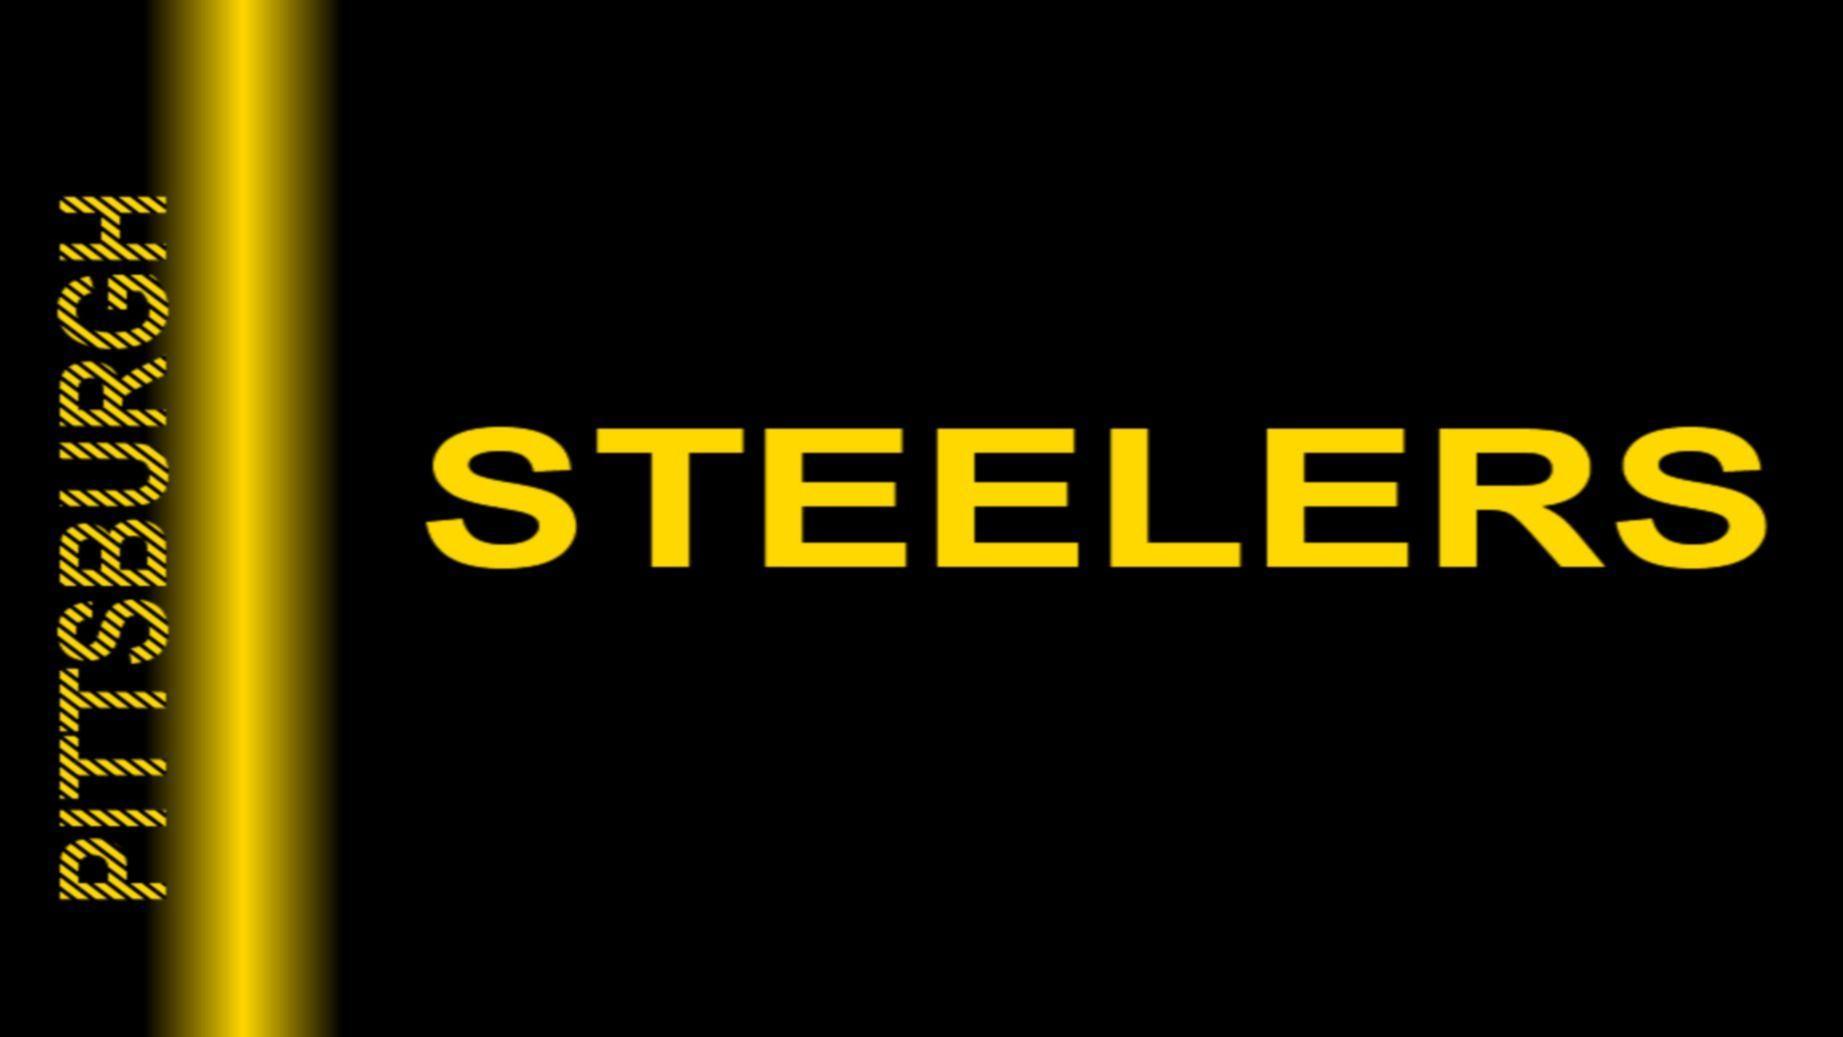 Pittsburgh Steelers Desktop Wallpapers 1843x1037